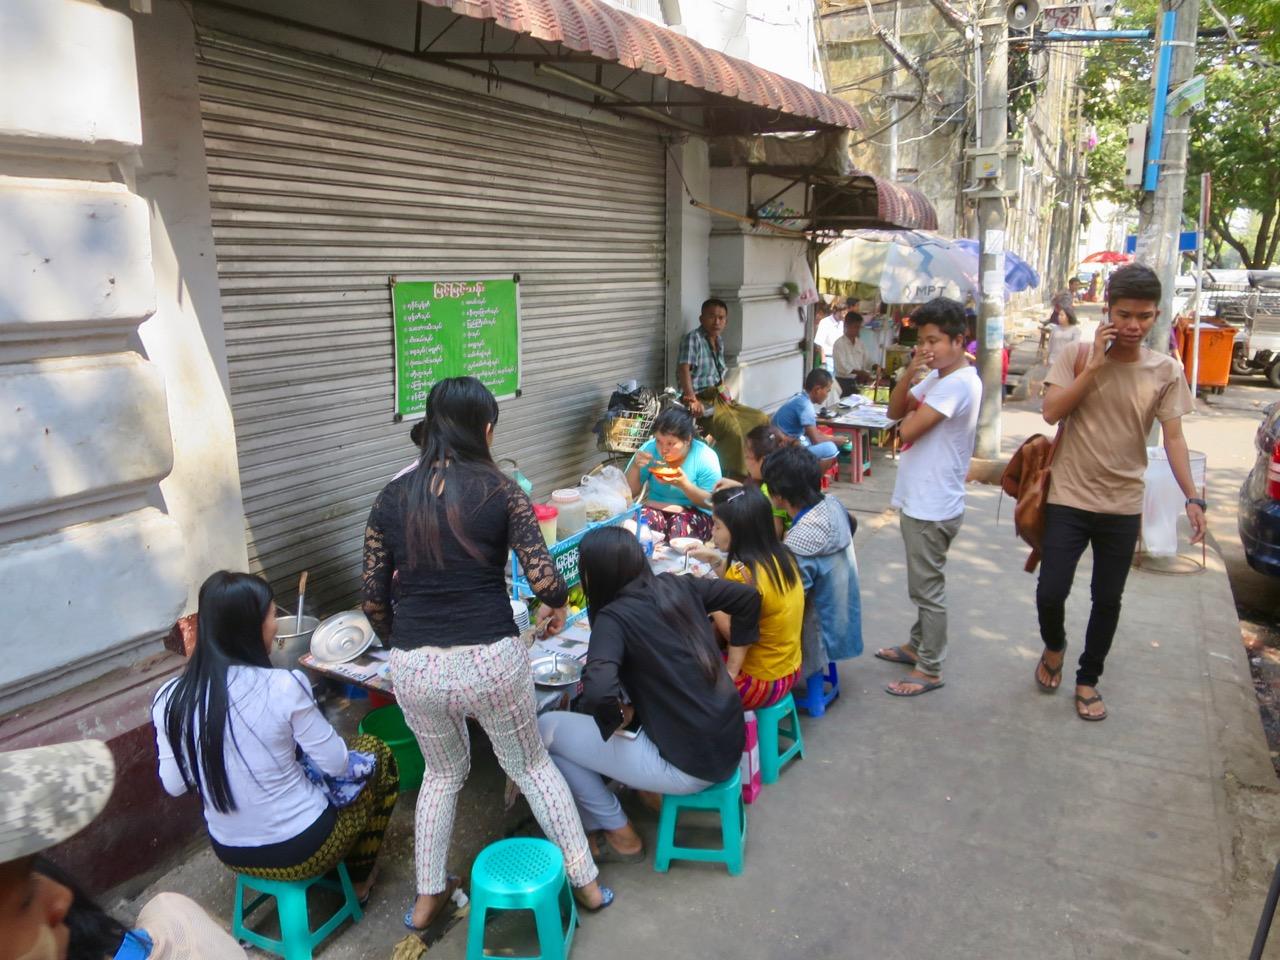 Onibus em Myanmar 1 02